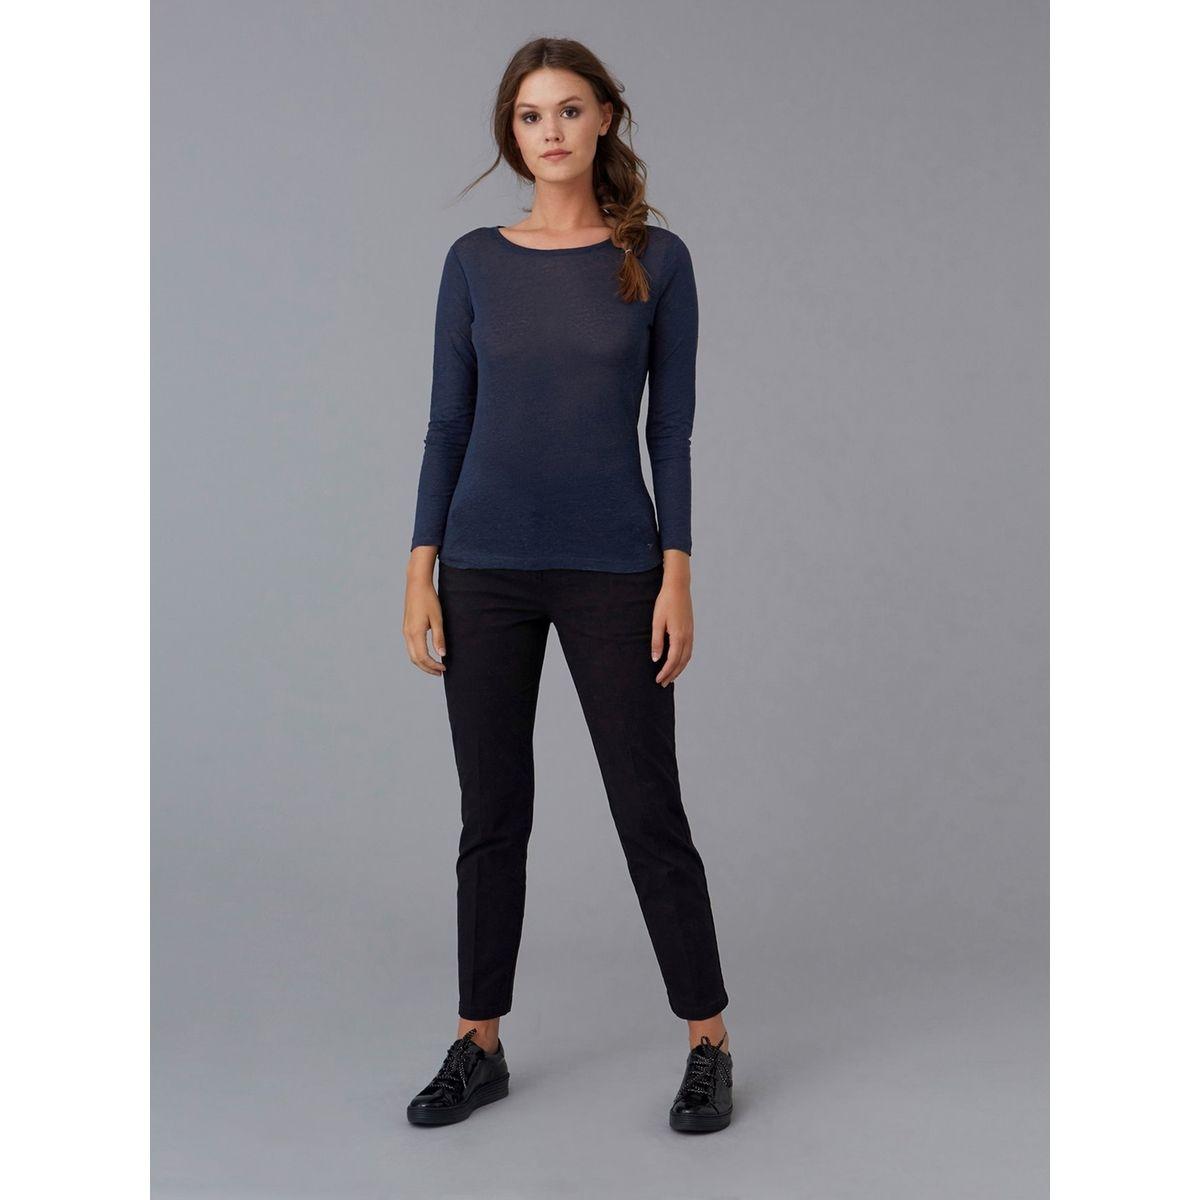 T-shirt femme jersey de lin col bateau